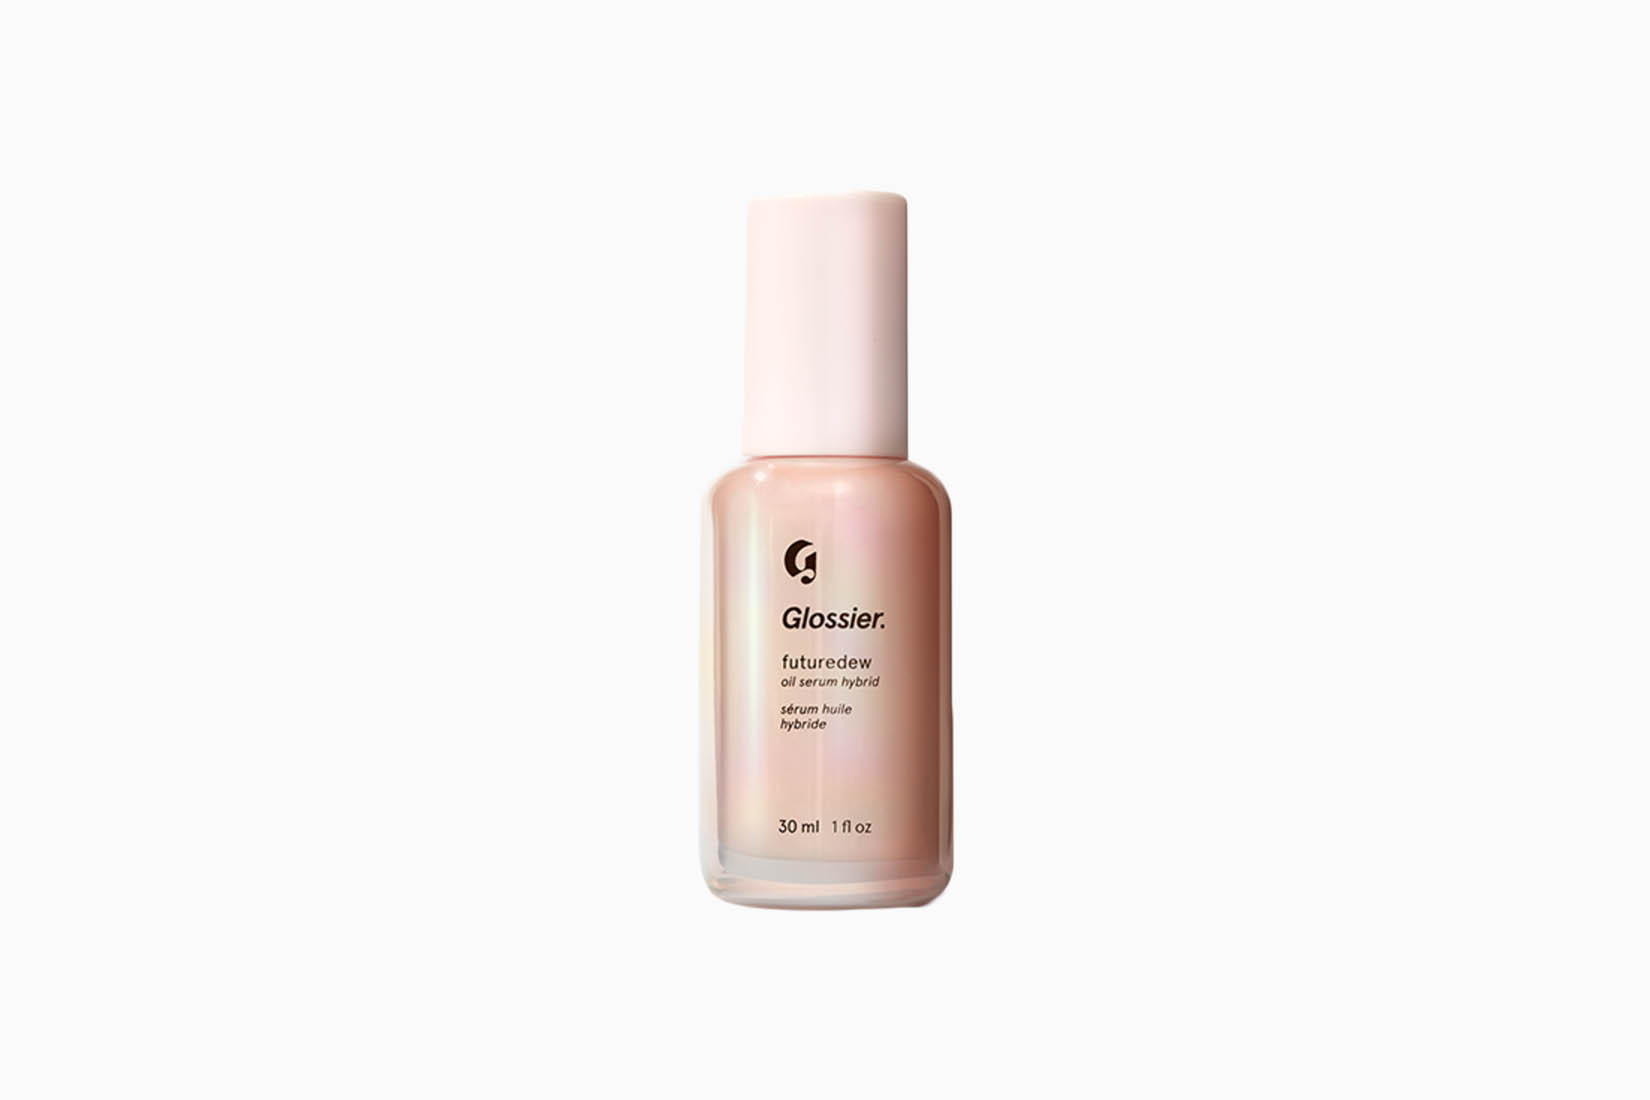 Best Face Oils Futuredew Review - Luxe Digital